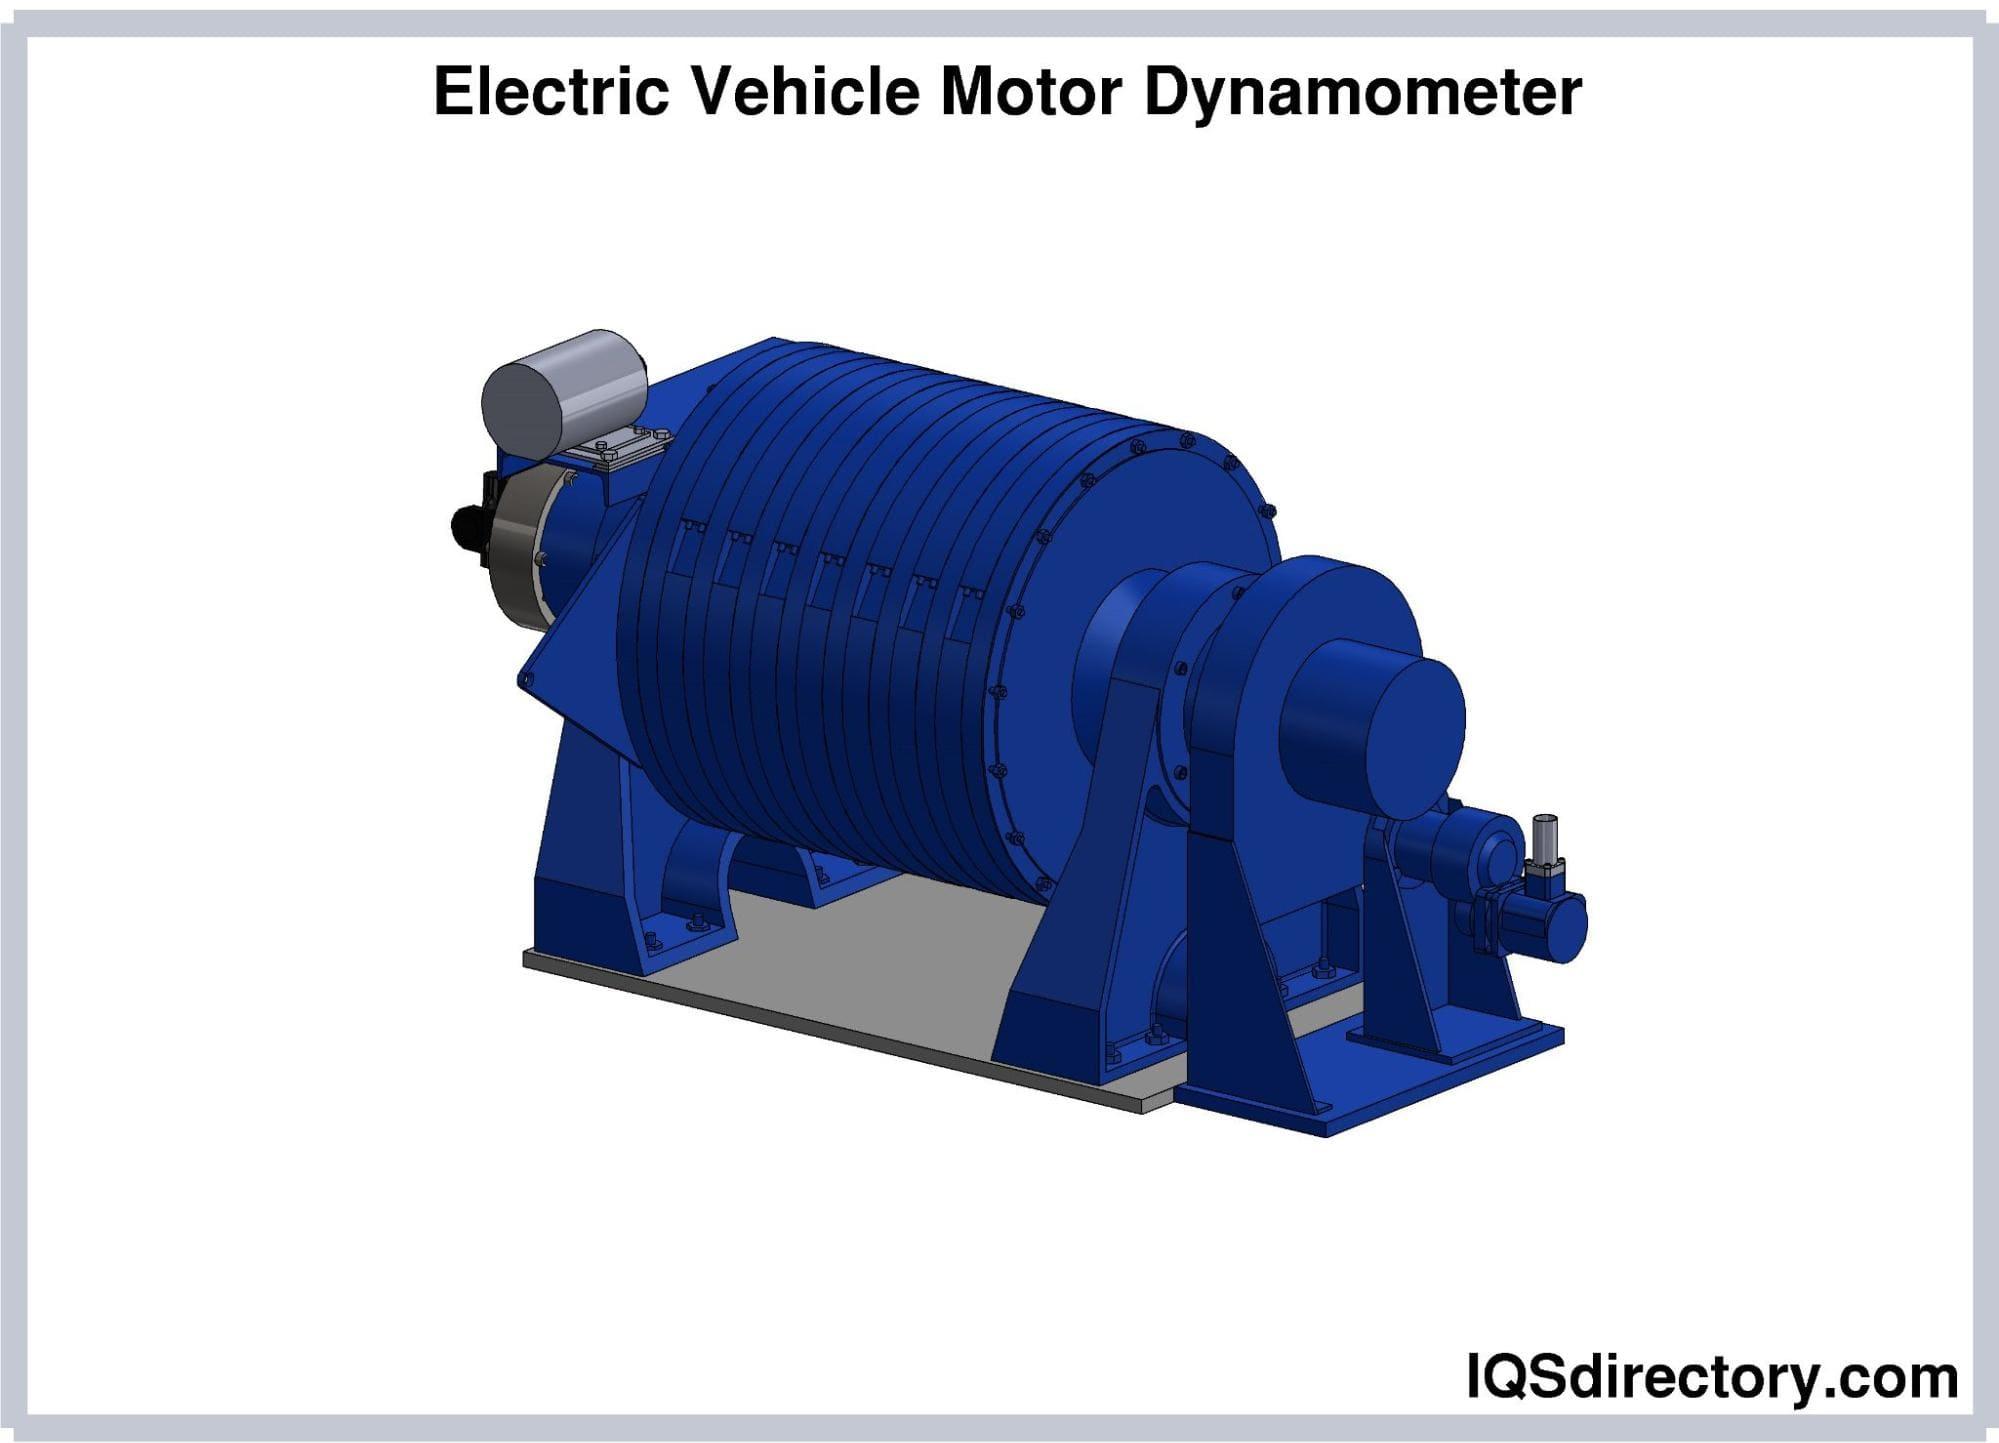 Electric Vehicle Motor Dynamometer